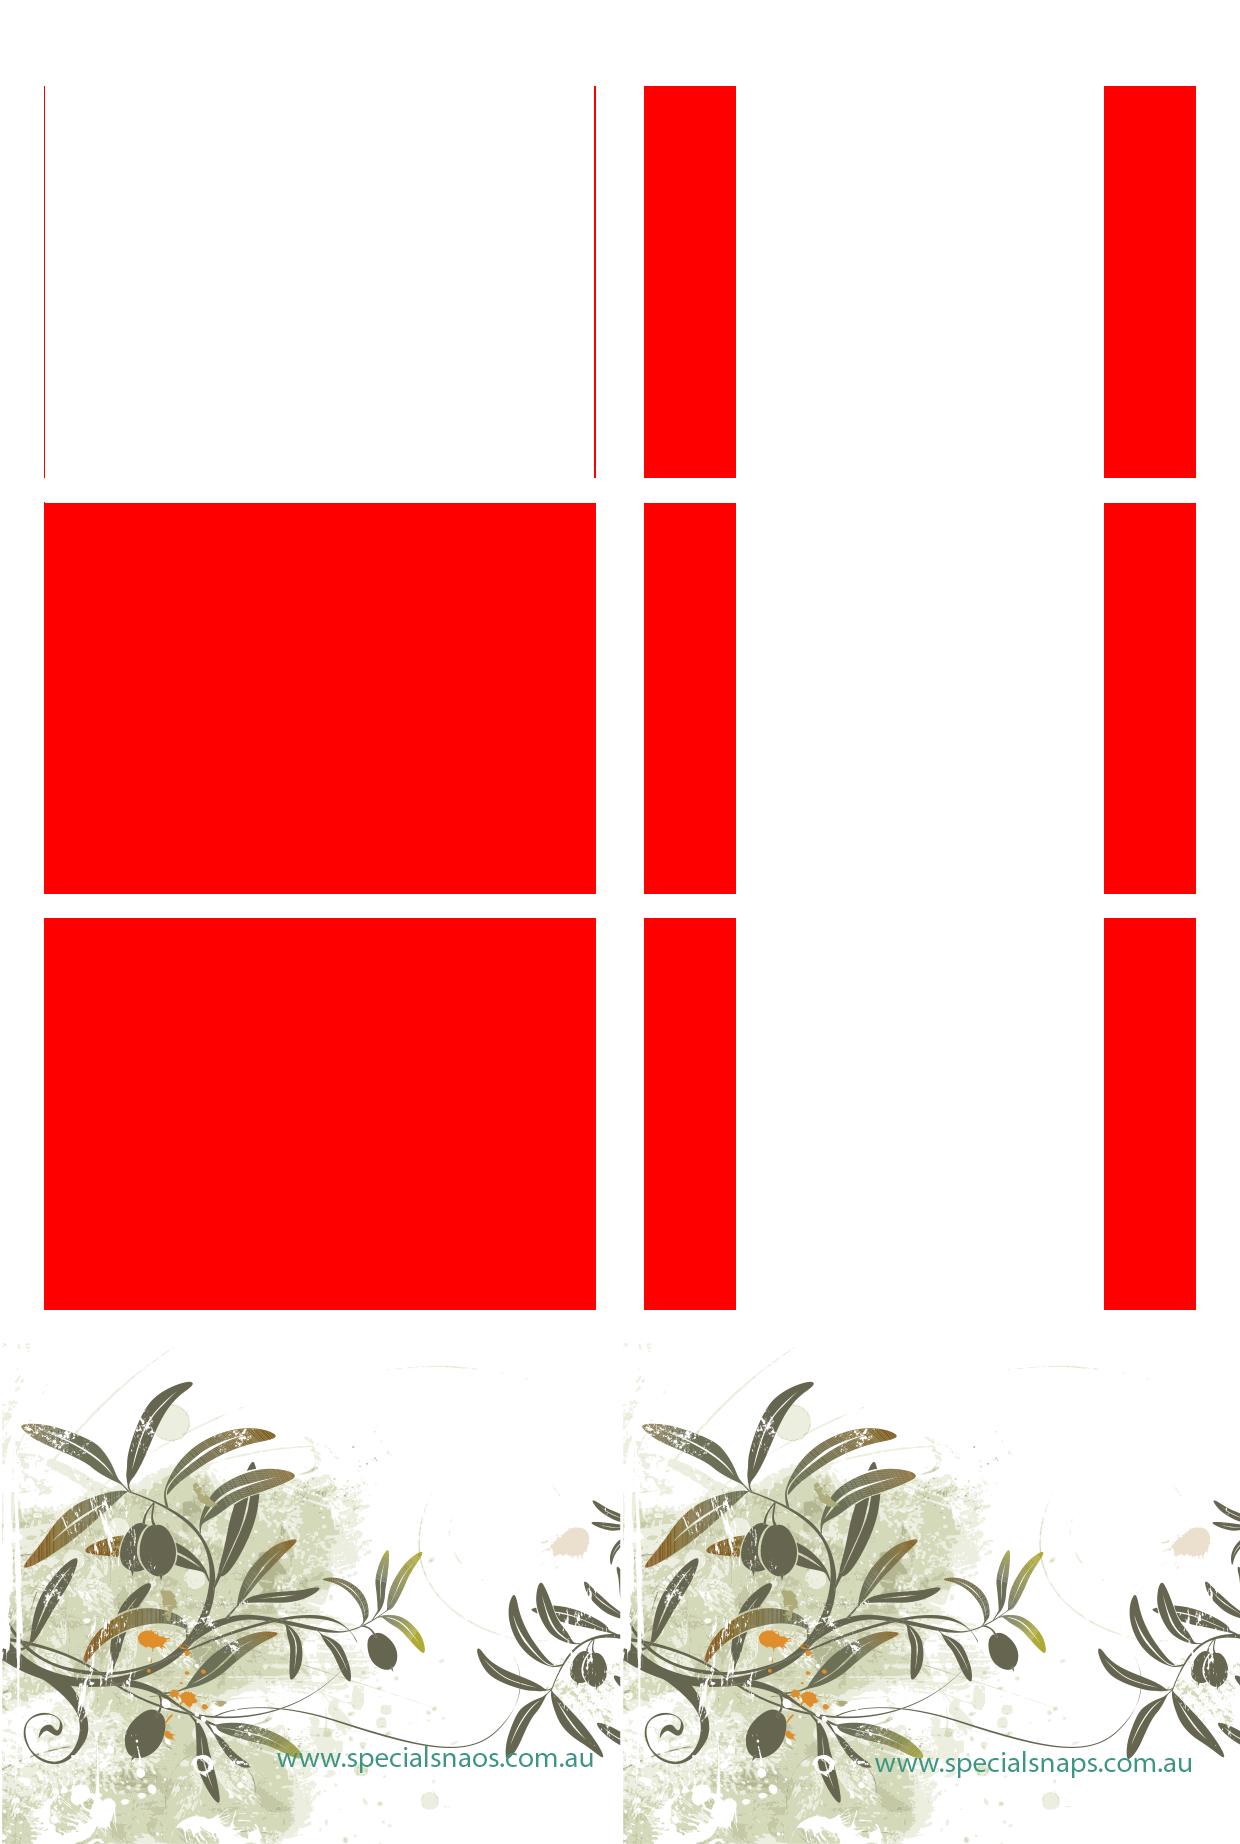 7. Green Plants